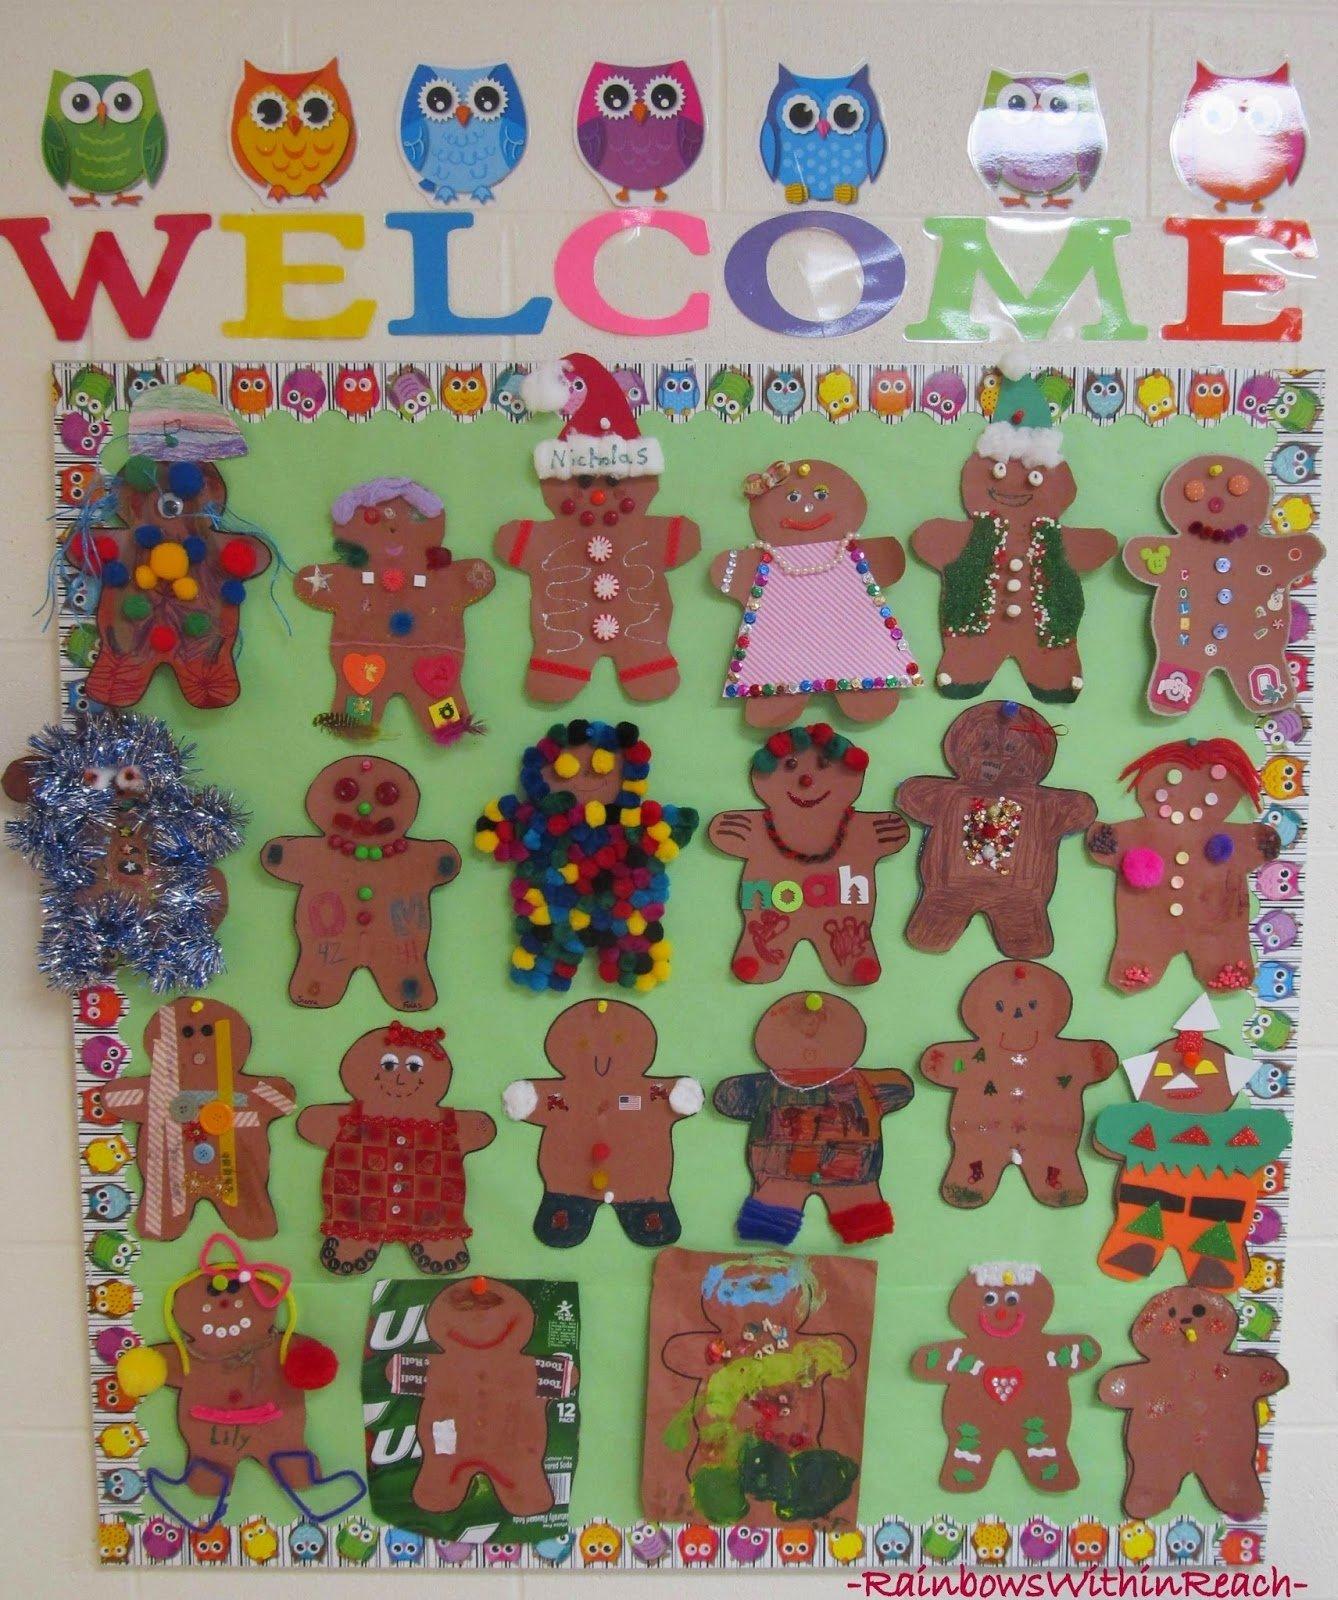 10 Wonderful Preschool Christmas Bulletin Board Ideas www rainbowswithinreach blogspot 13 2020